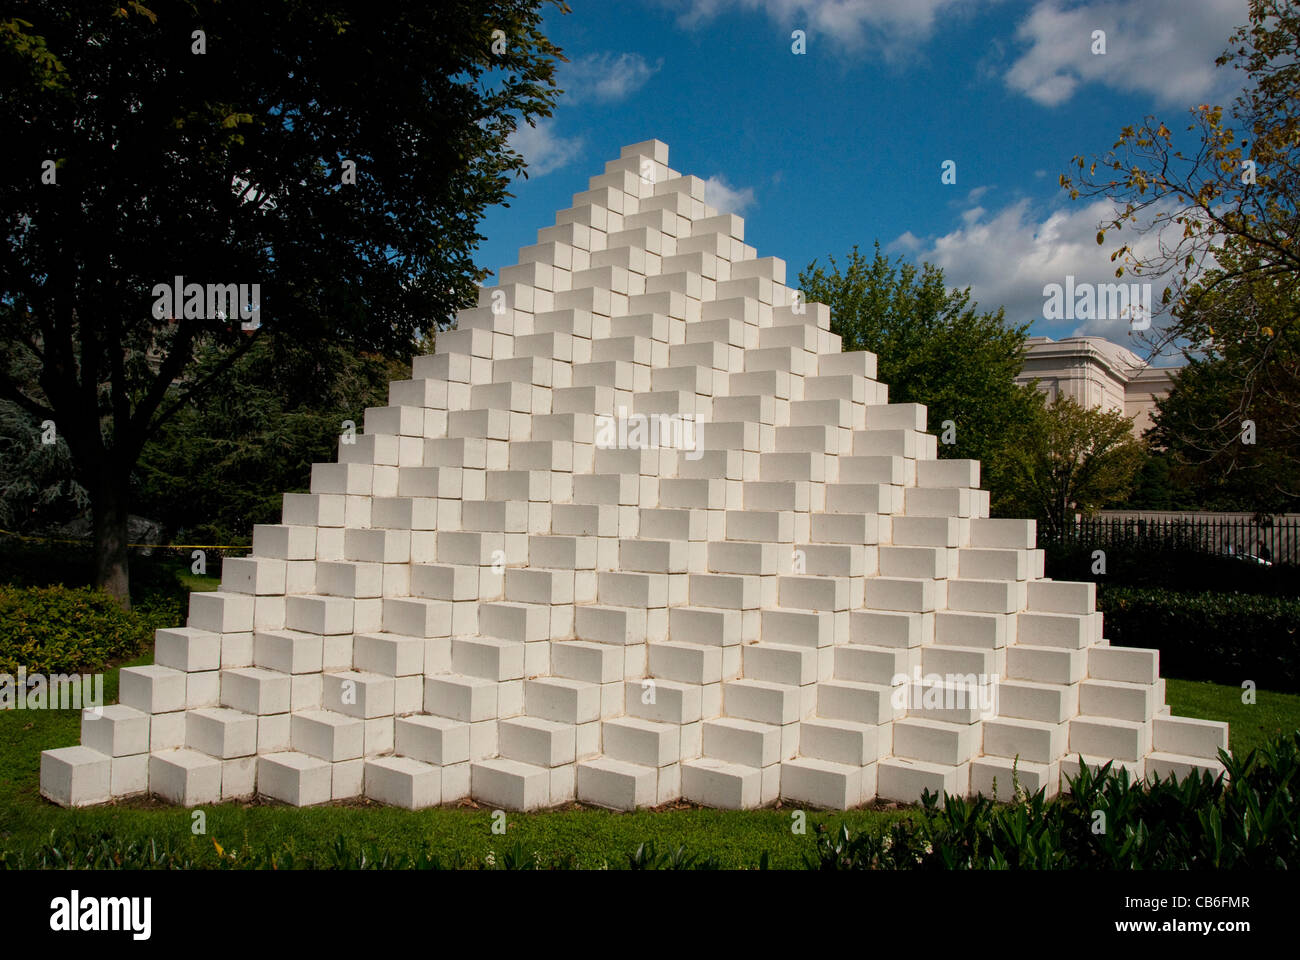 National Sculpture Garden Four-Sided Pyramid Sol Lewitt Washington DC dc12 national park landmark art carving sculpture - Stock Image